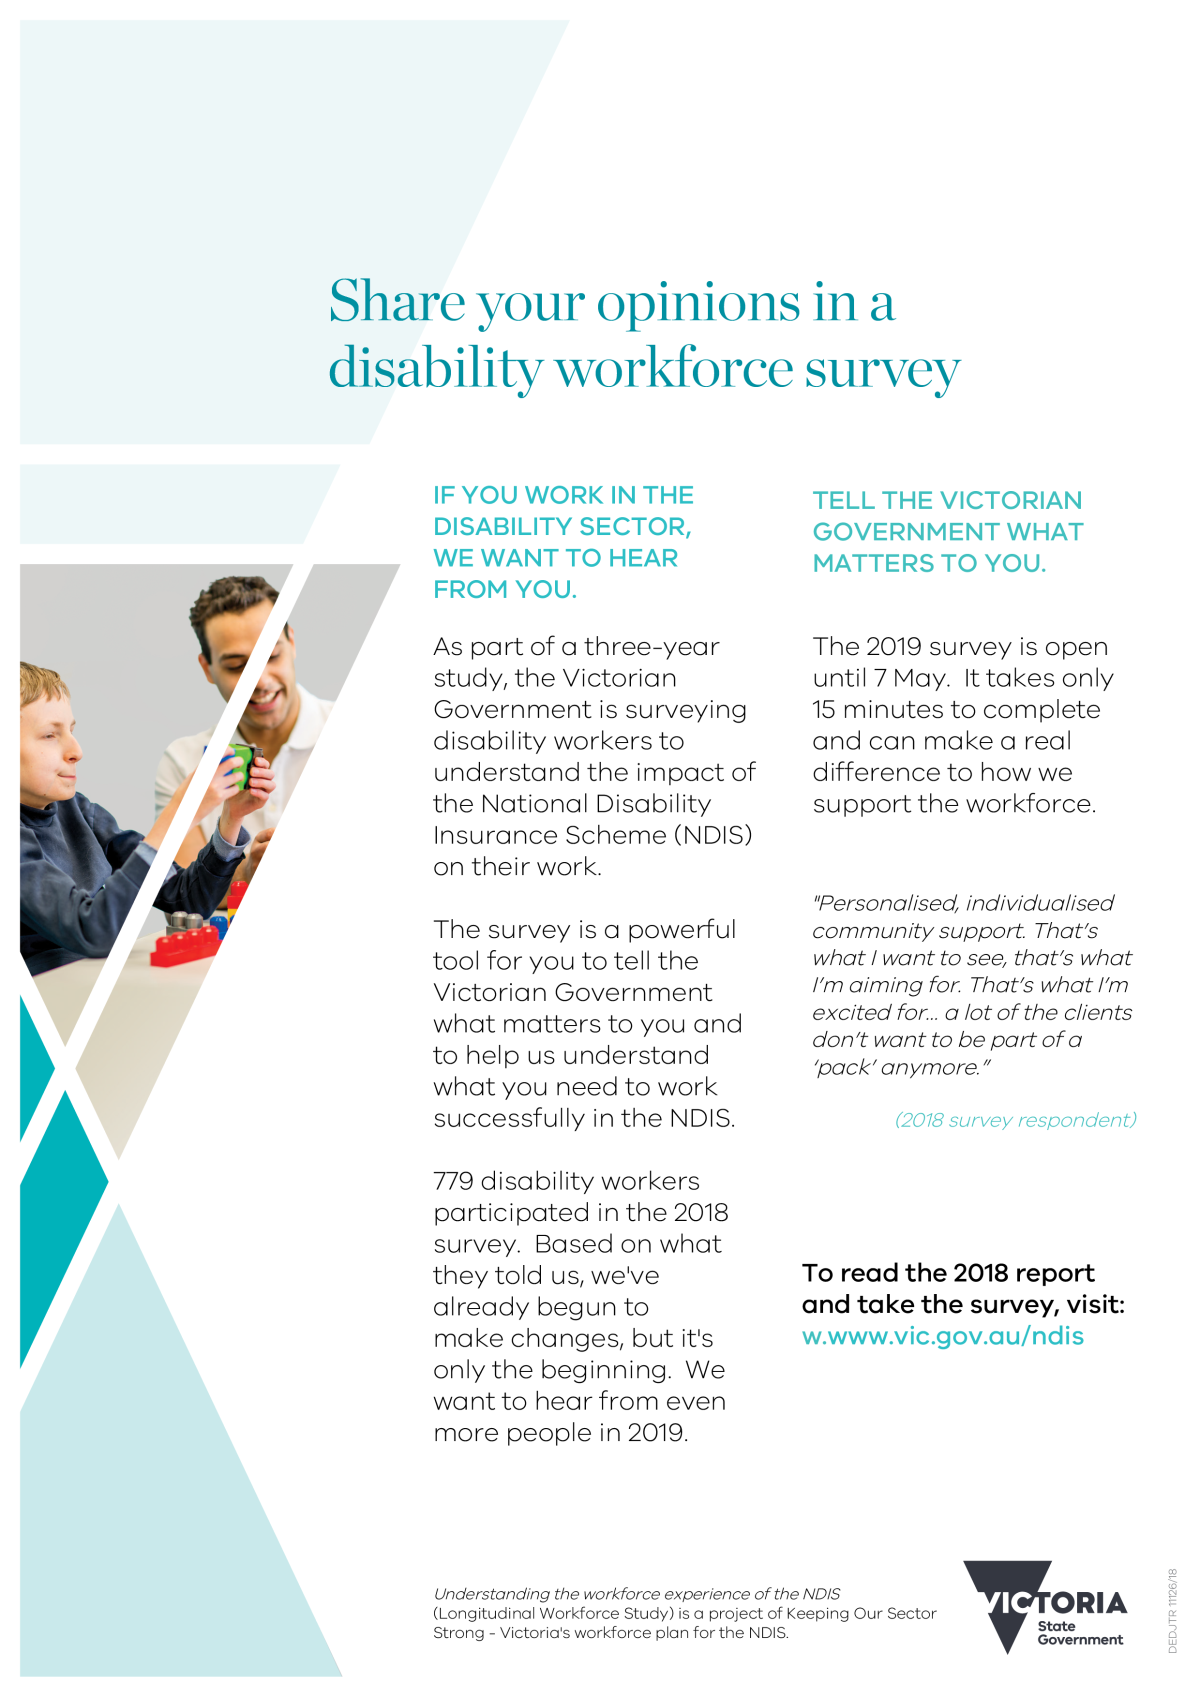 DHHS survey